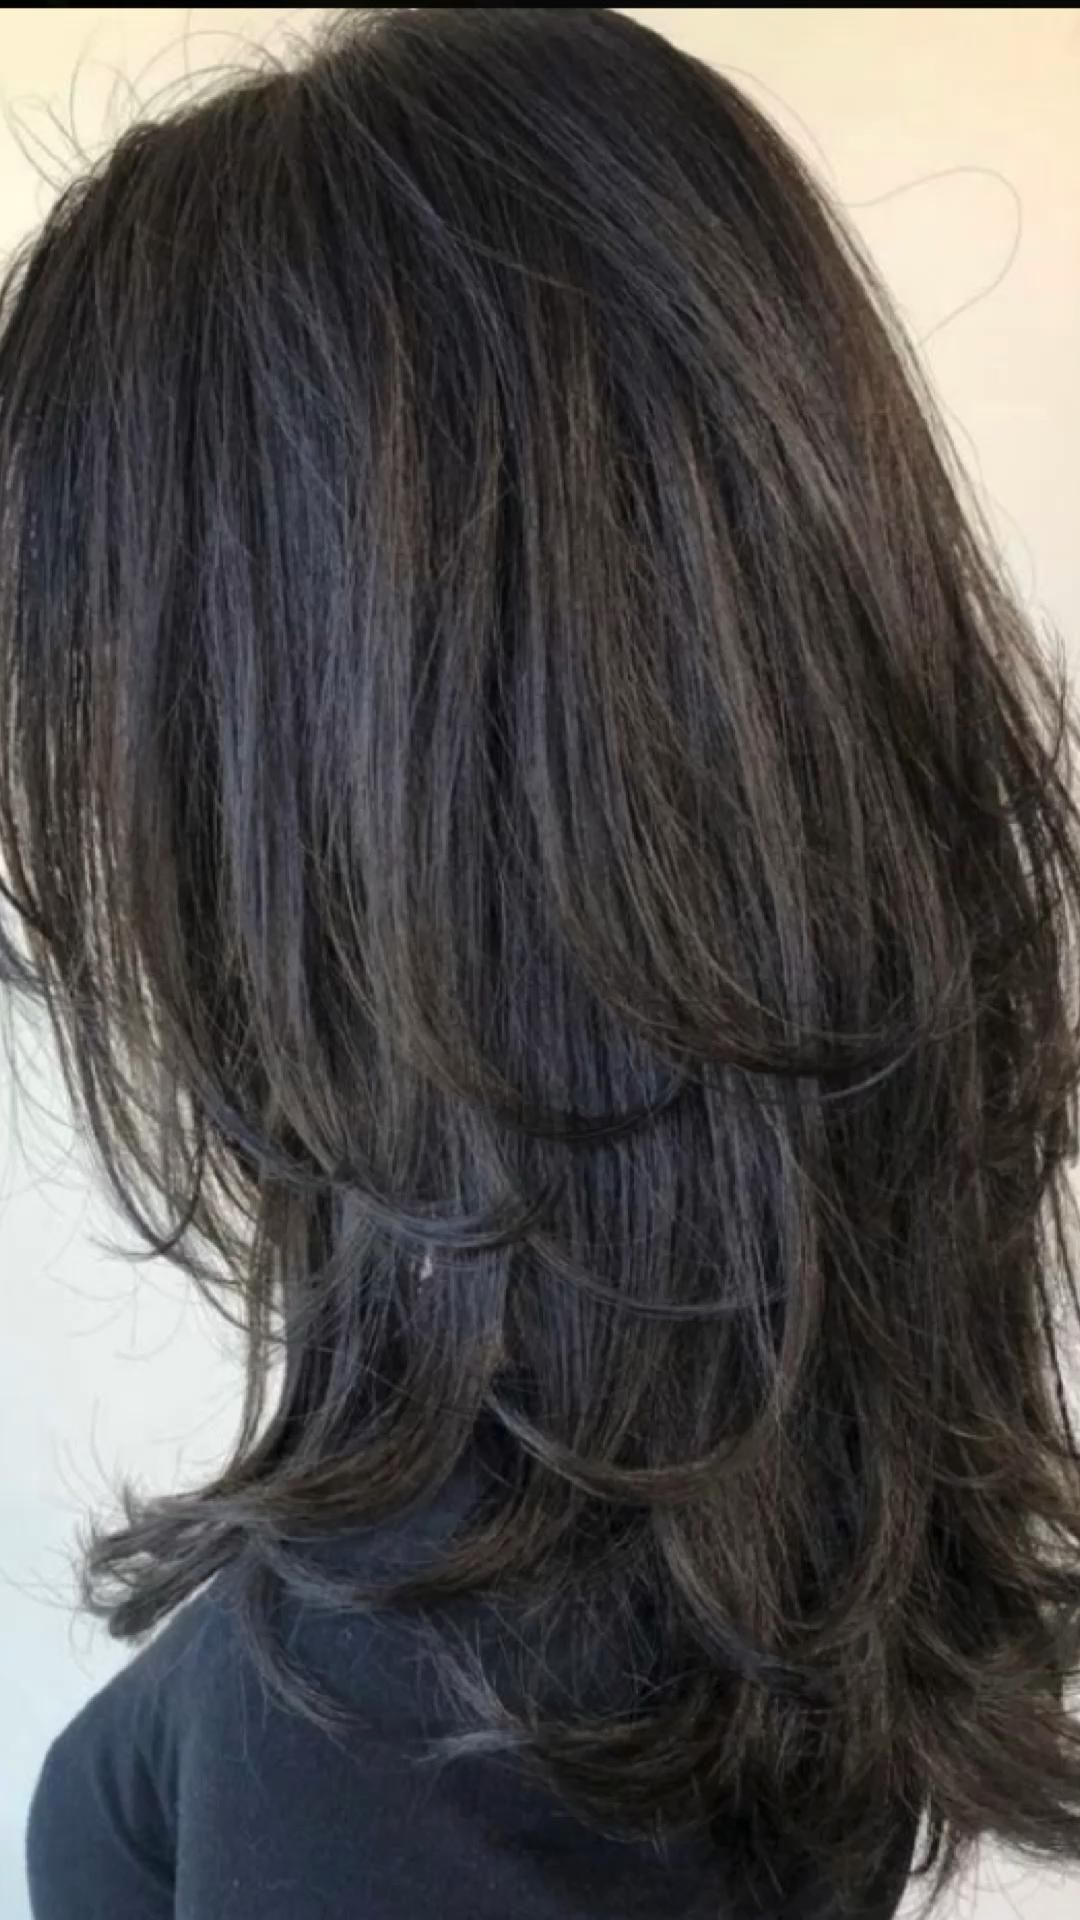 18 easy hairstyles for medium length hair – Artofit